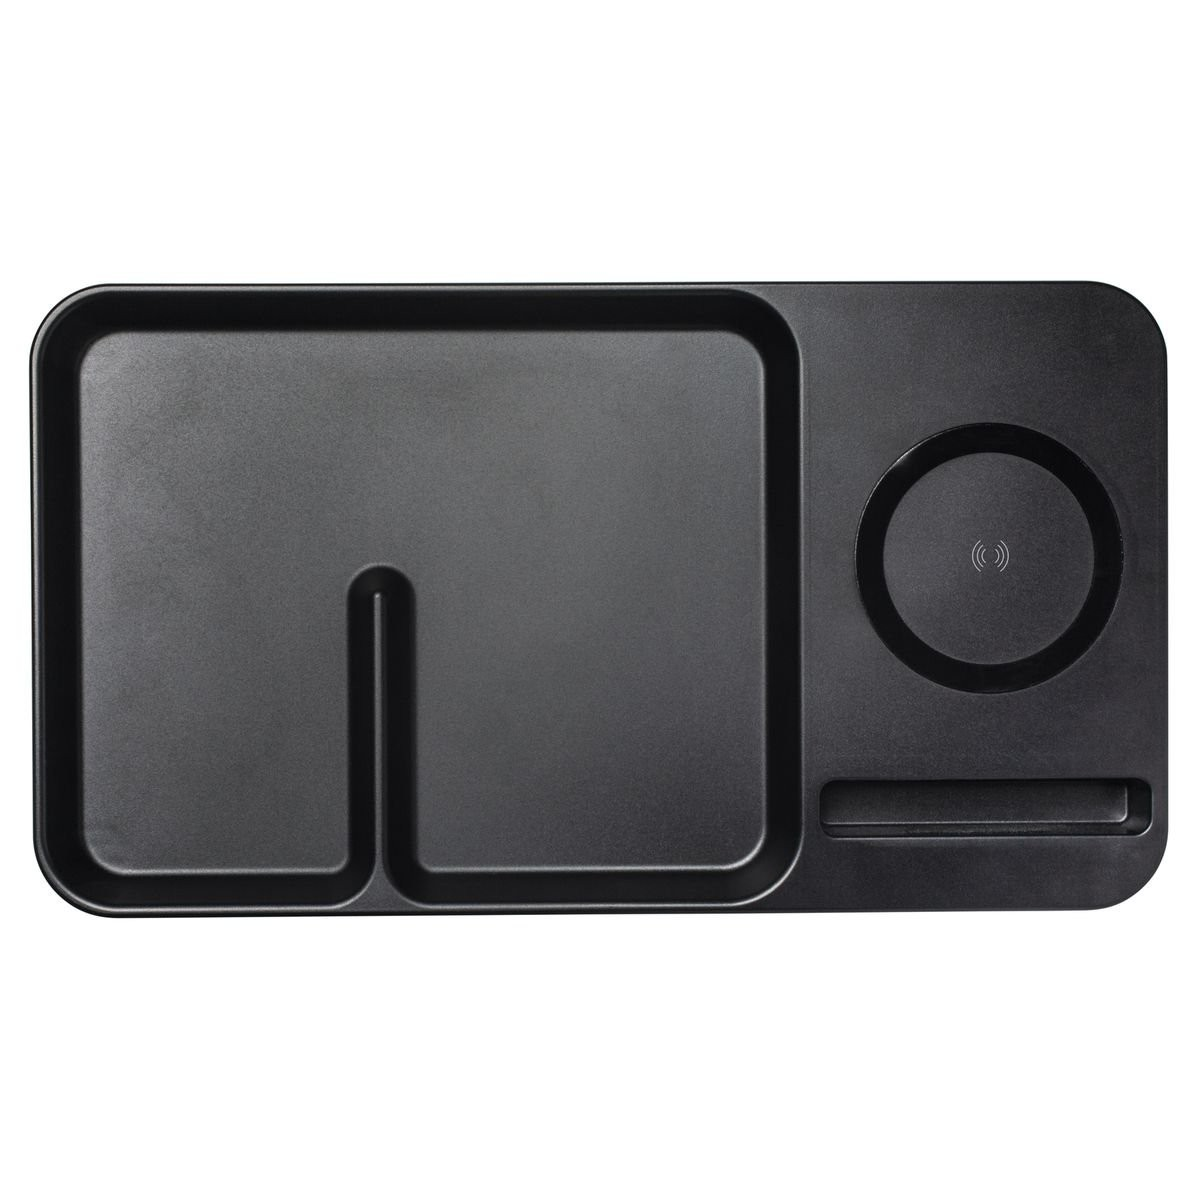 Desktoporganizer met draadloze oplader REFLECTS-MÉ, View 2